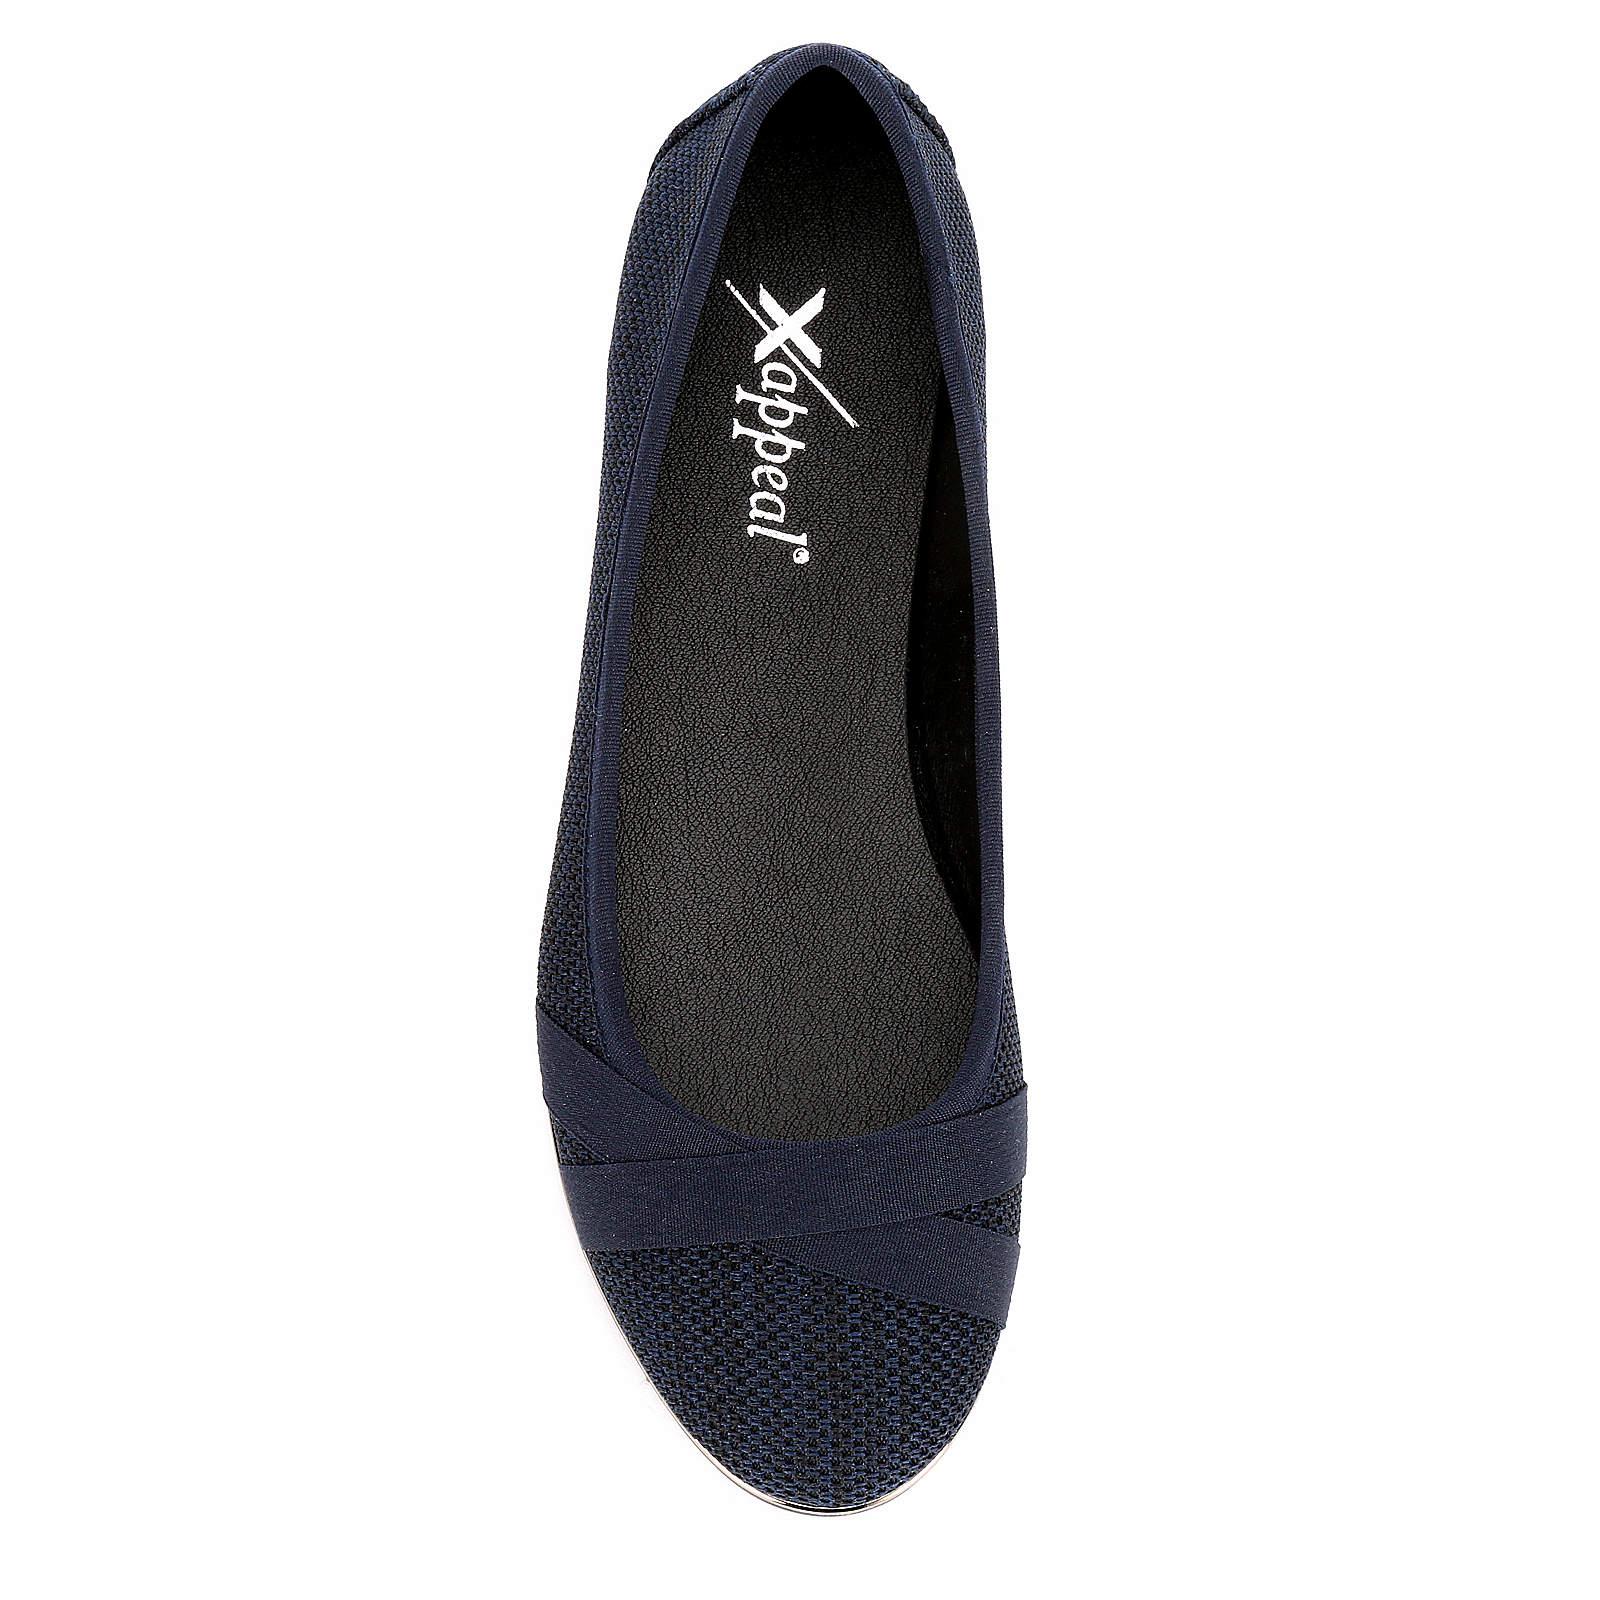 XAPPEAL-Womens-Mitzie-Slip-On-Mesh-Flat-Shoes thumbnail 7